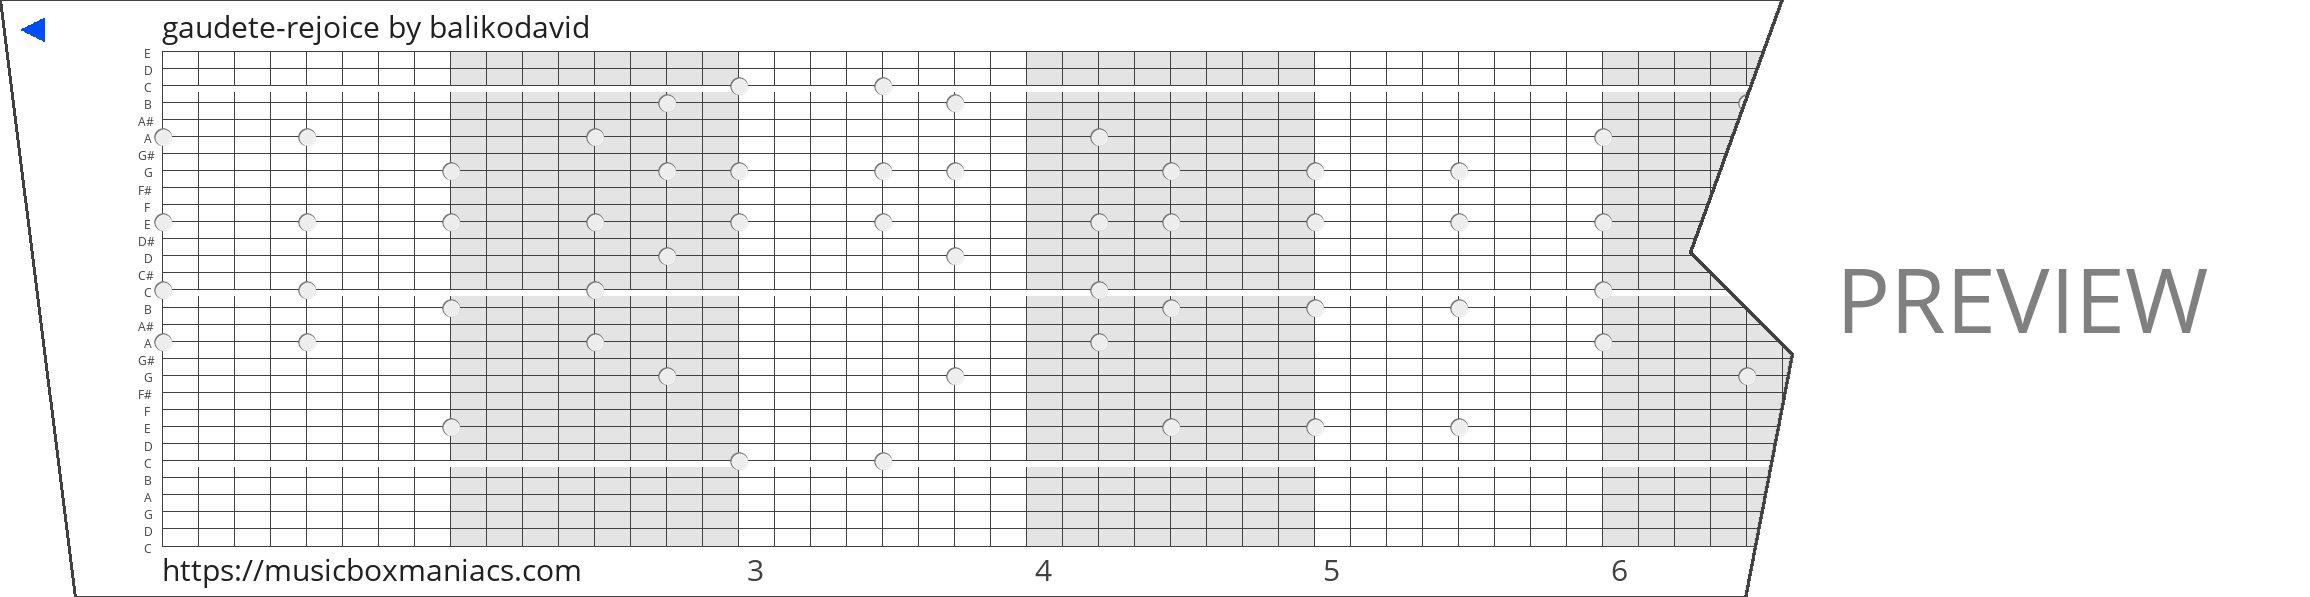 gaudete-rejoice 30 note music box paper strip